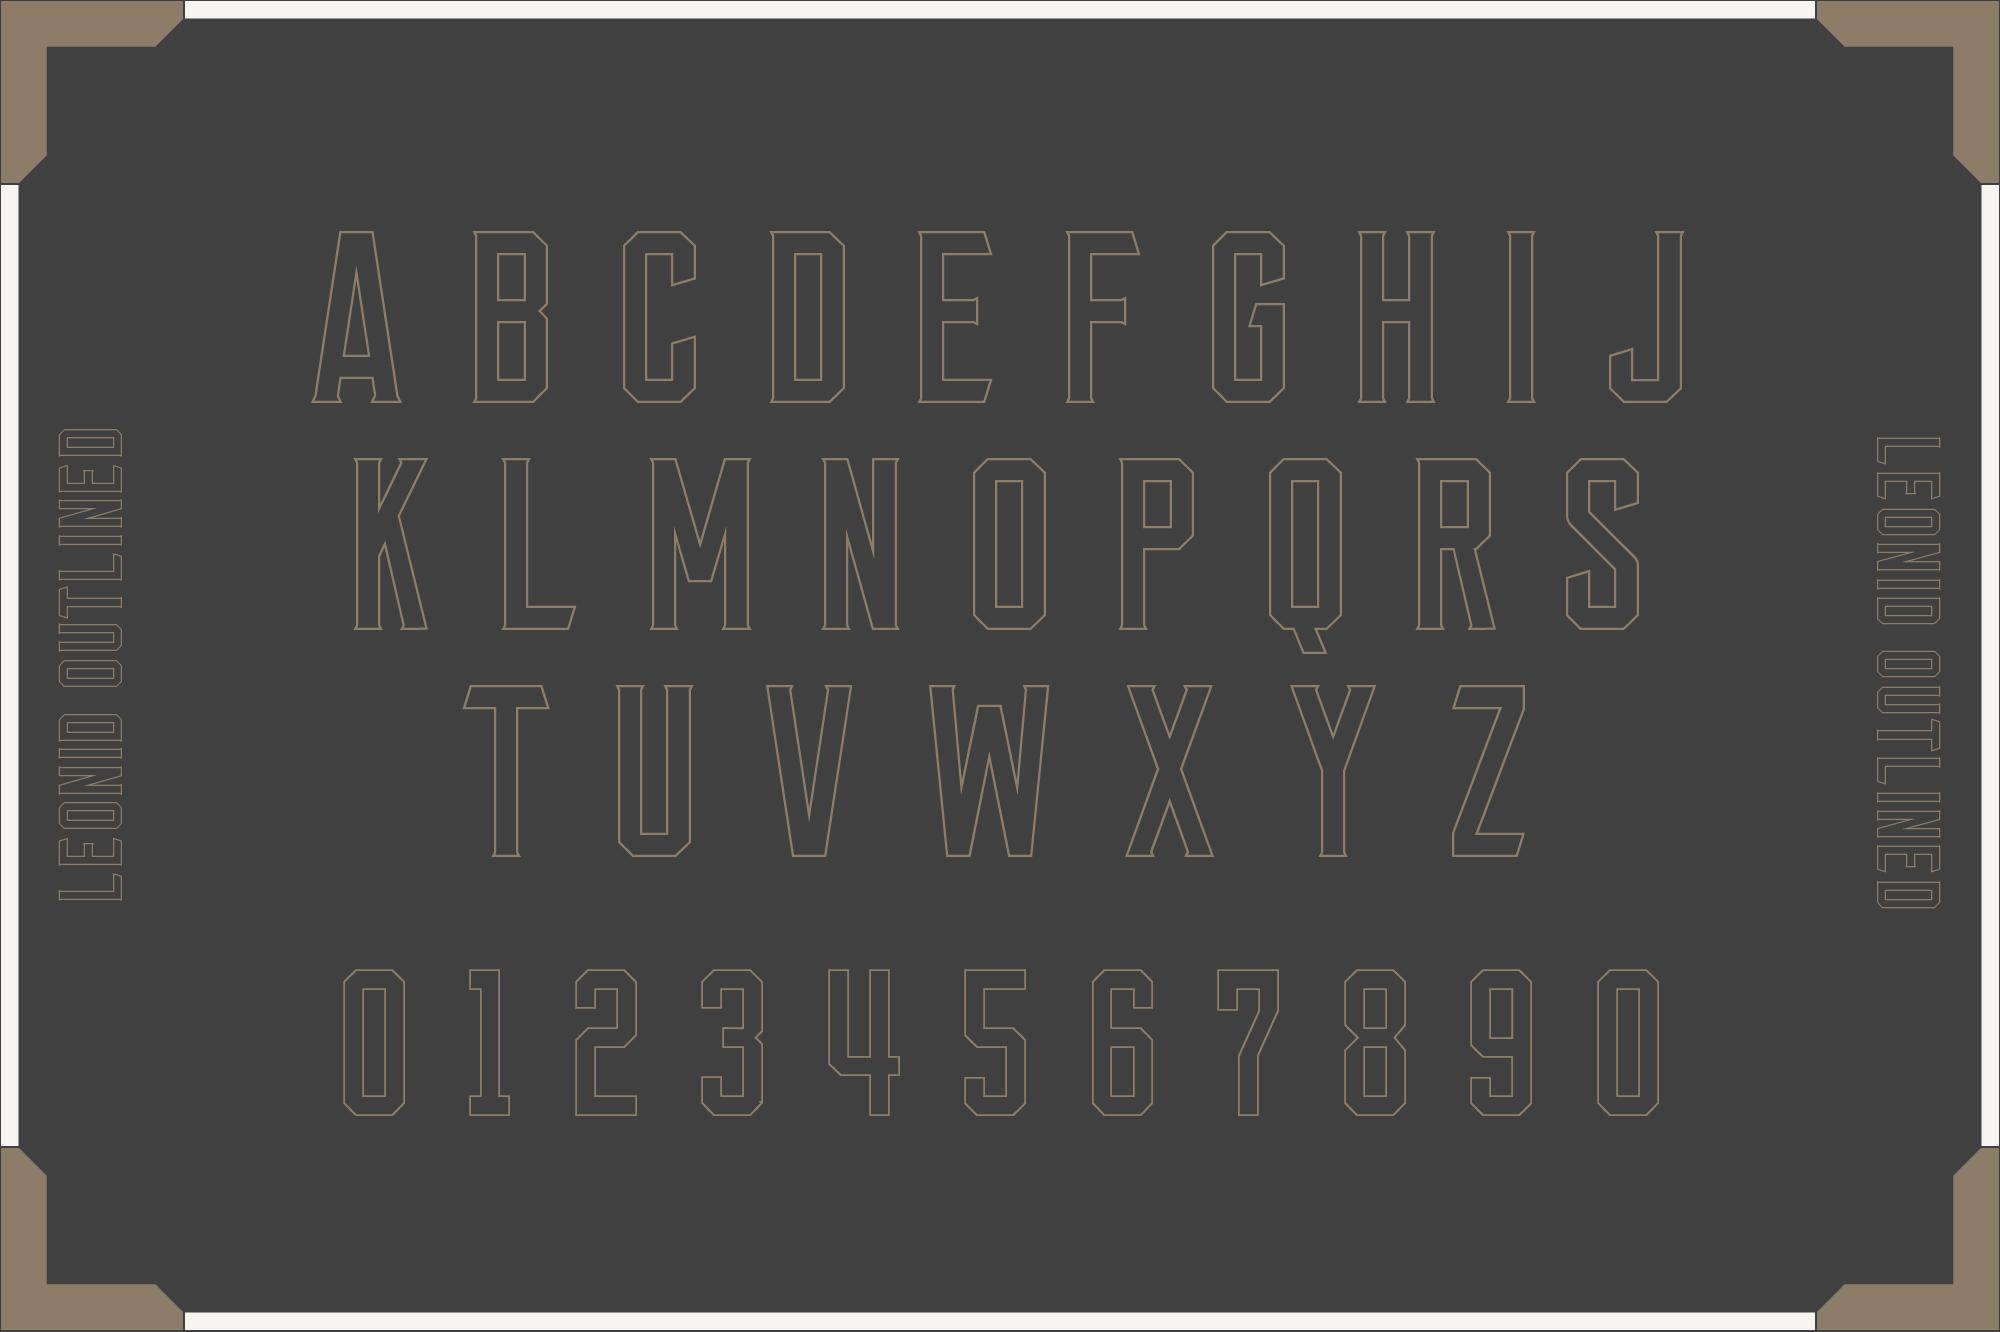 Leonid Retro Layered Font Pack example image 5